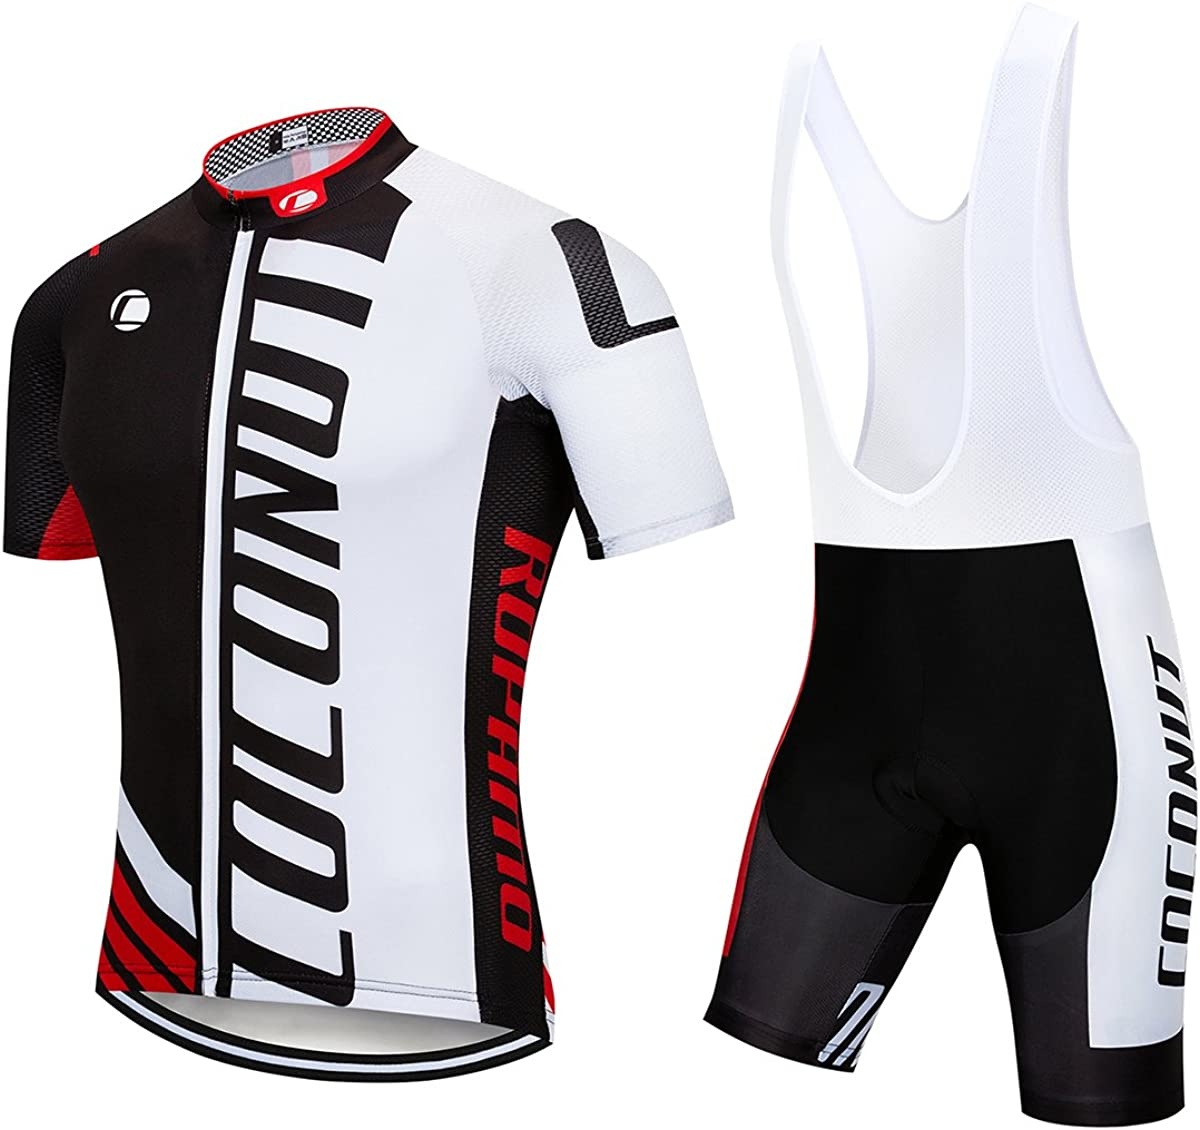 Men's Cycling Jersey Short Sleeve Full Zip Bike Clothing Set Quick-Dry Bib Shorts with 3D Gel Padded: Clothing